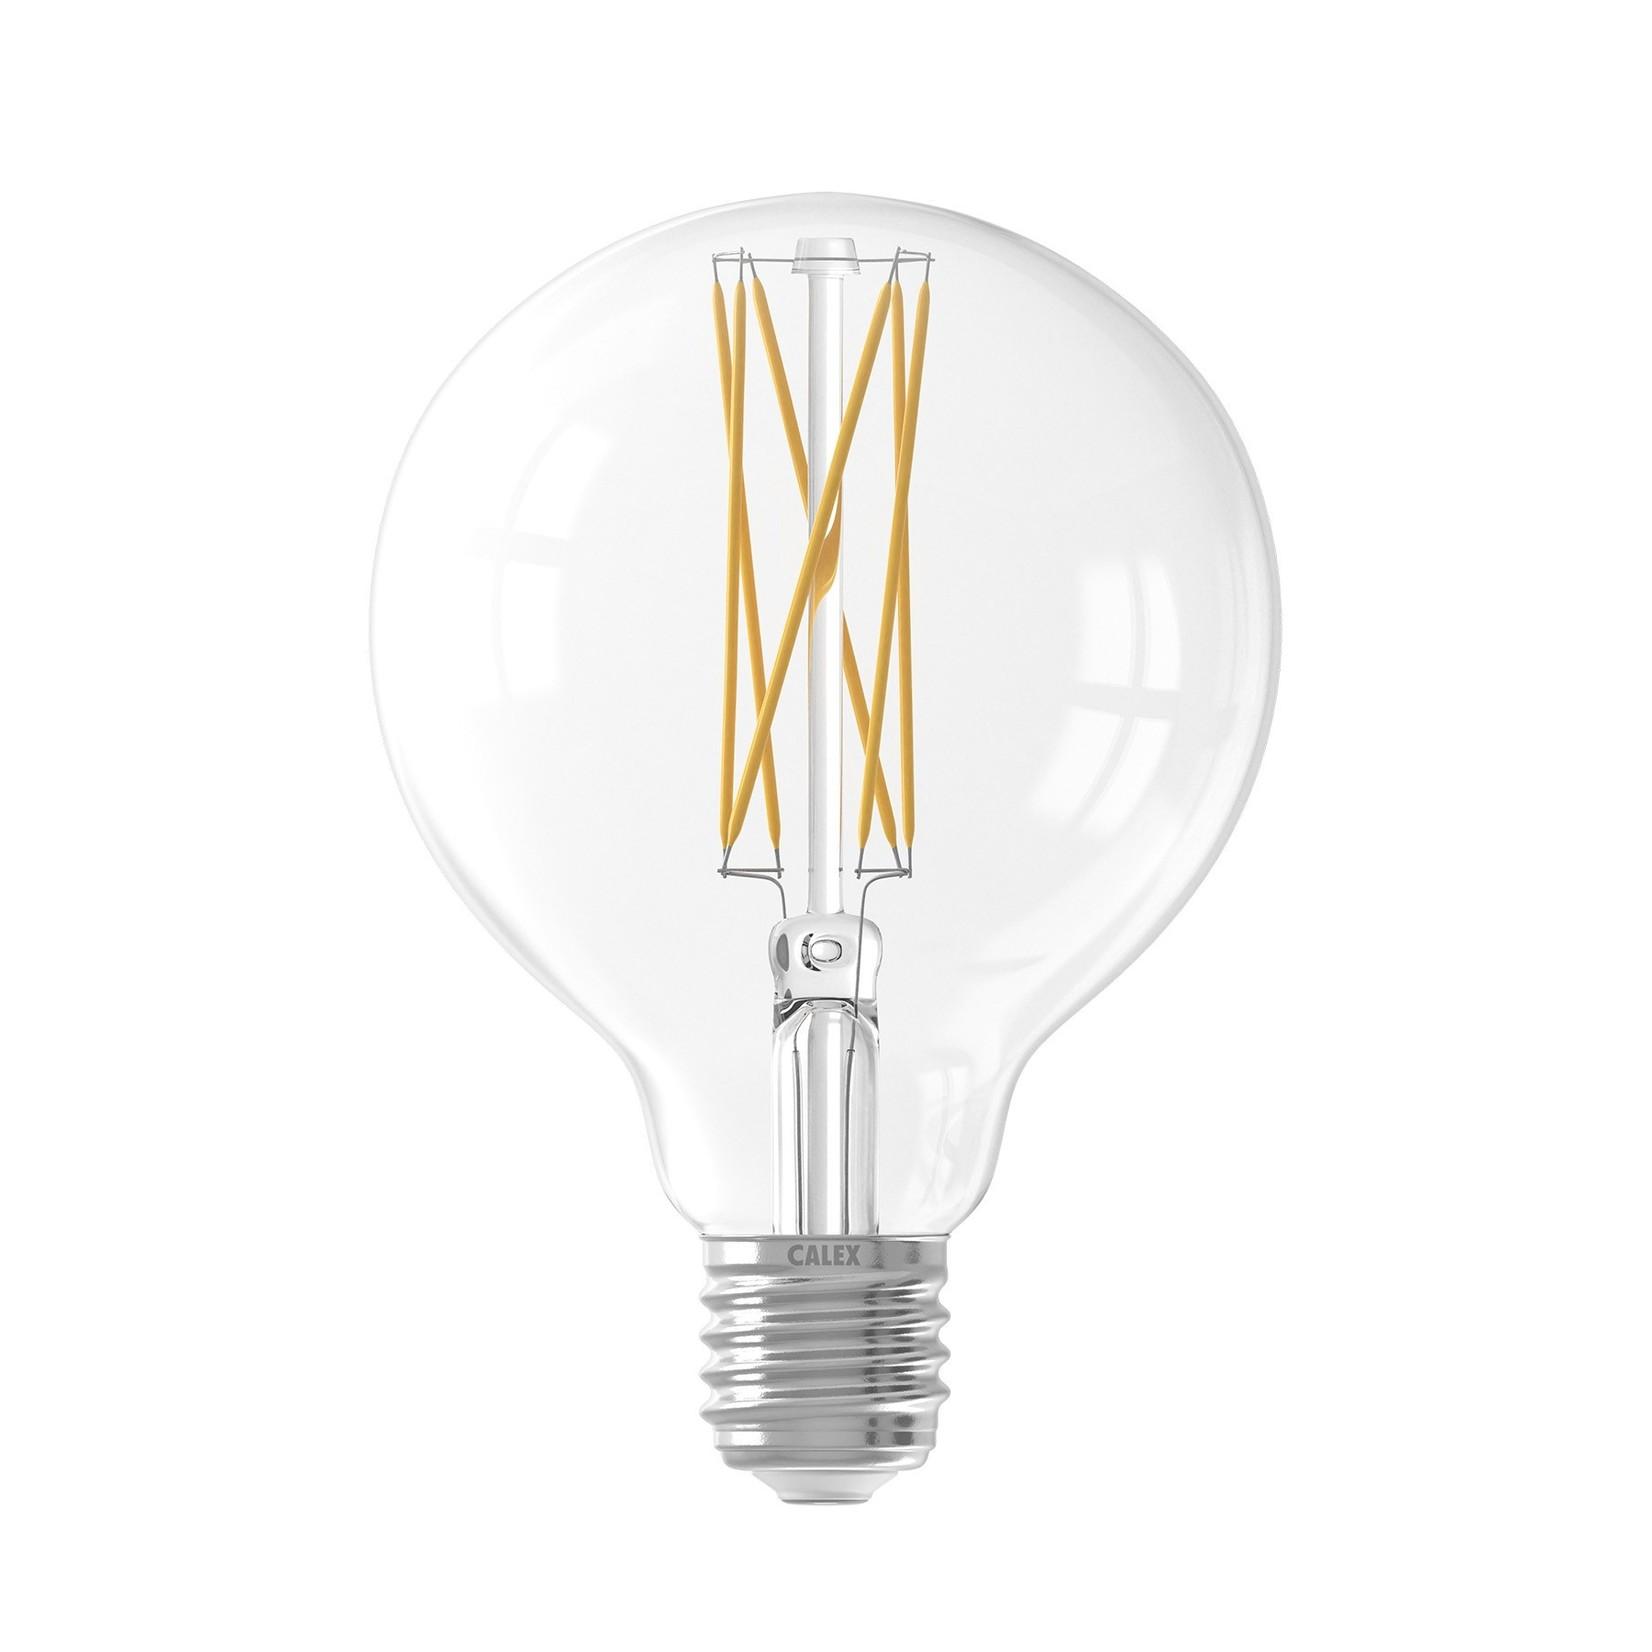 LED 95mm 4W 230V E27 2300K Clear